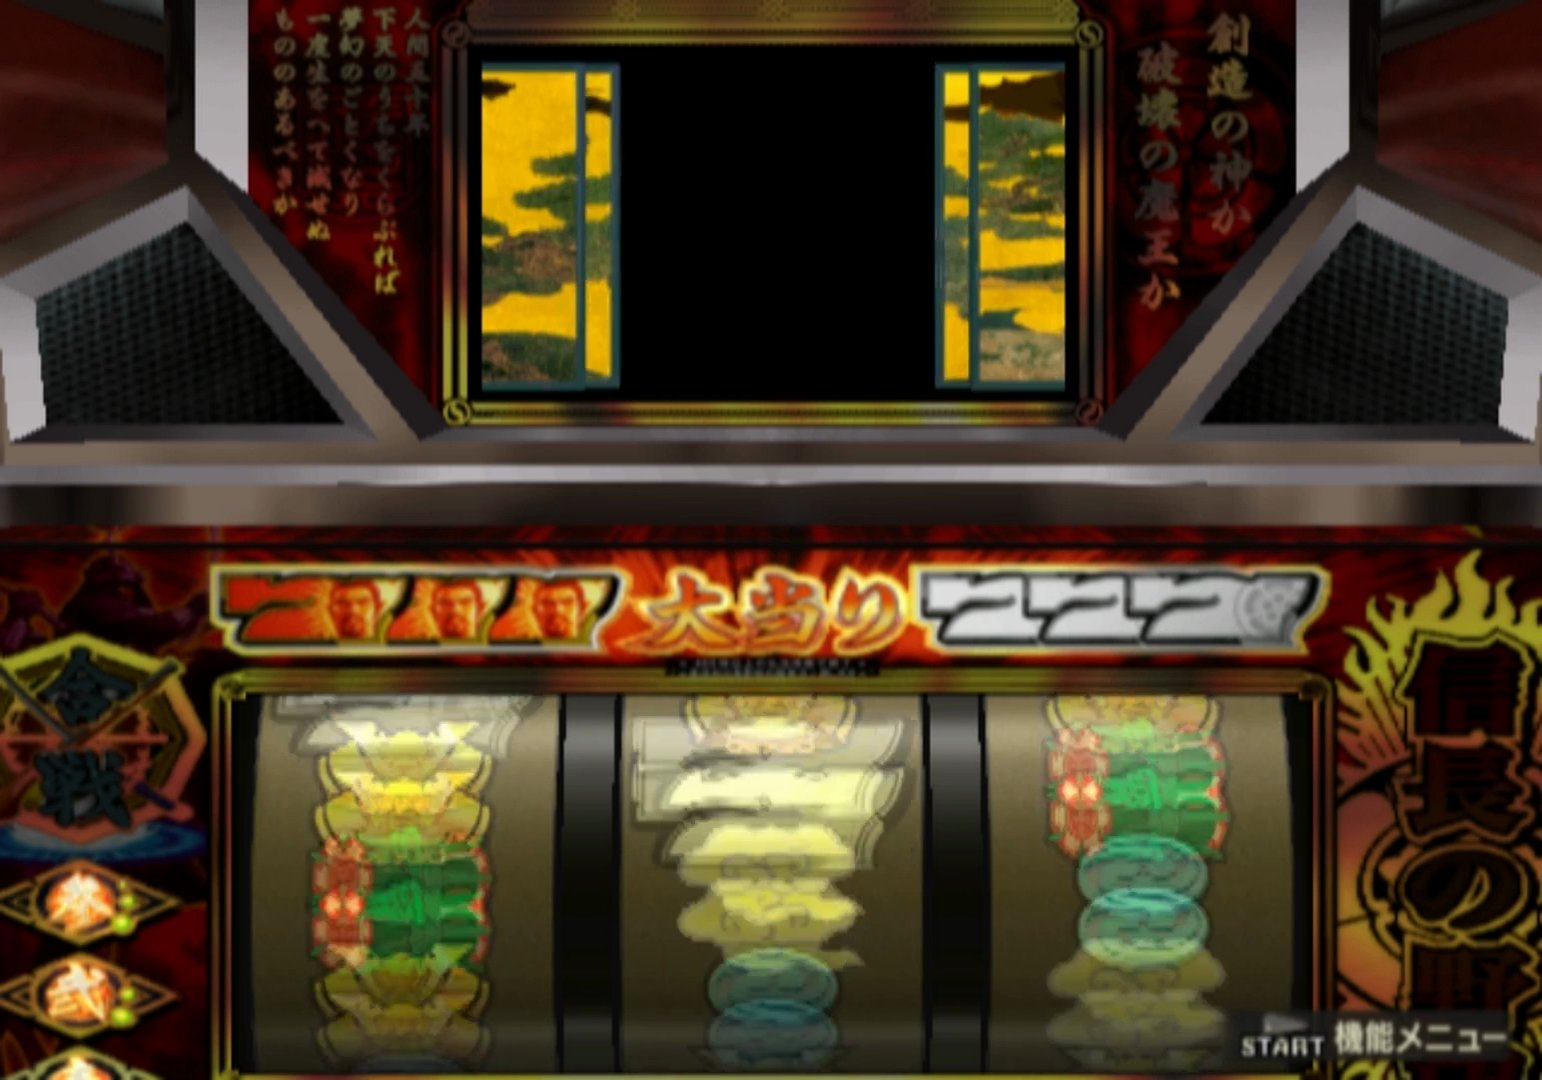 Pachi-Slot Nobunaga no Yabou Tenka Sousei Gameplay HD 1080p PS2